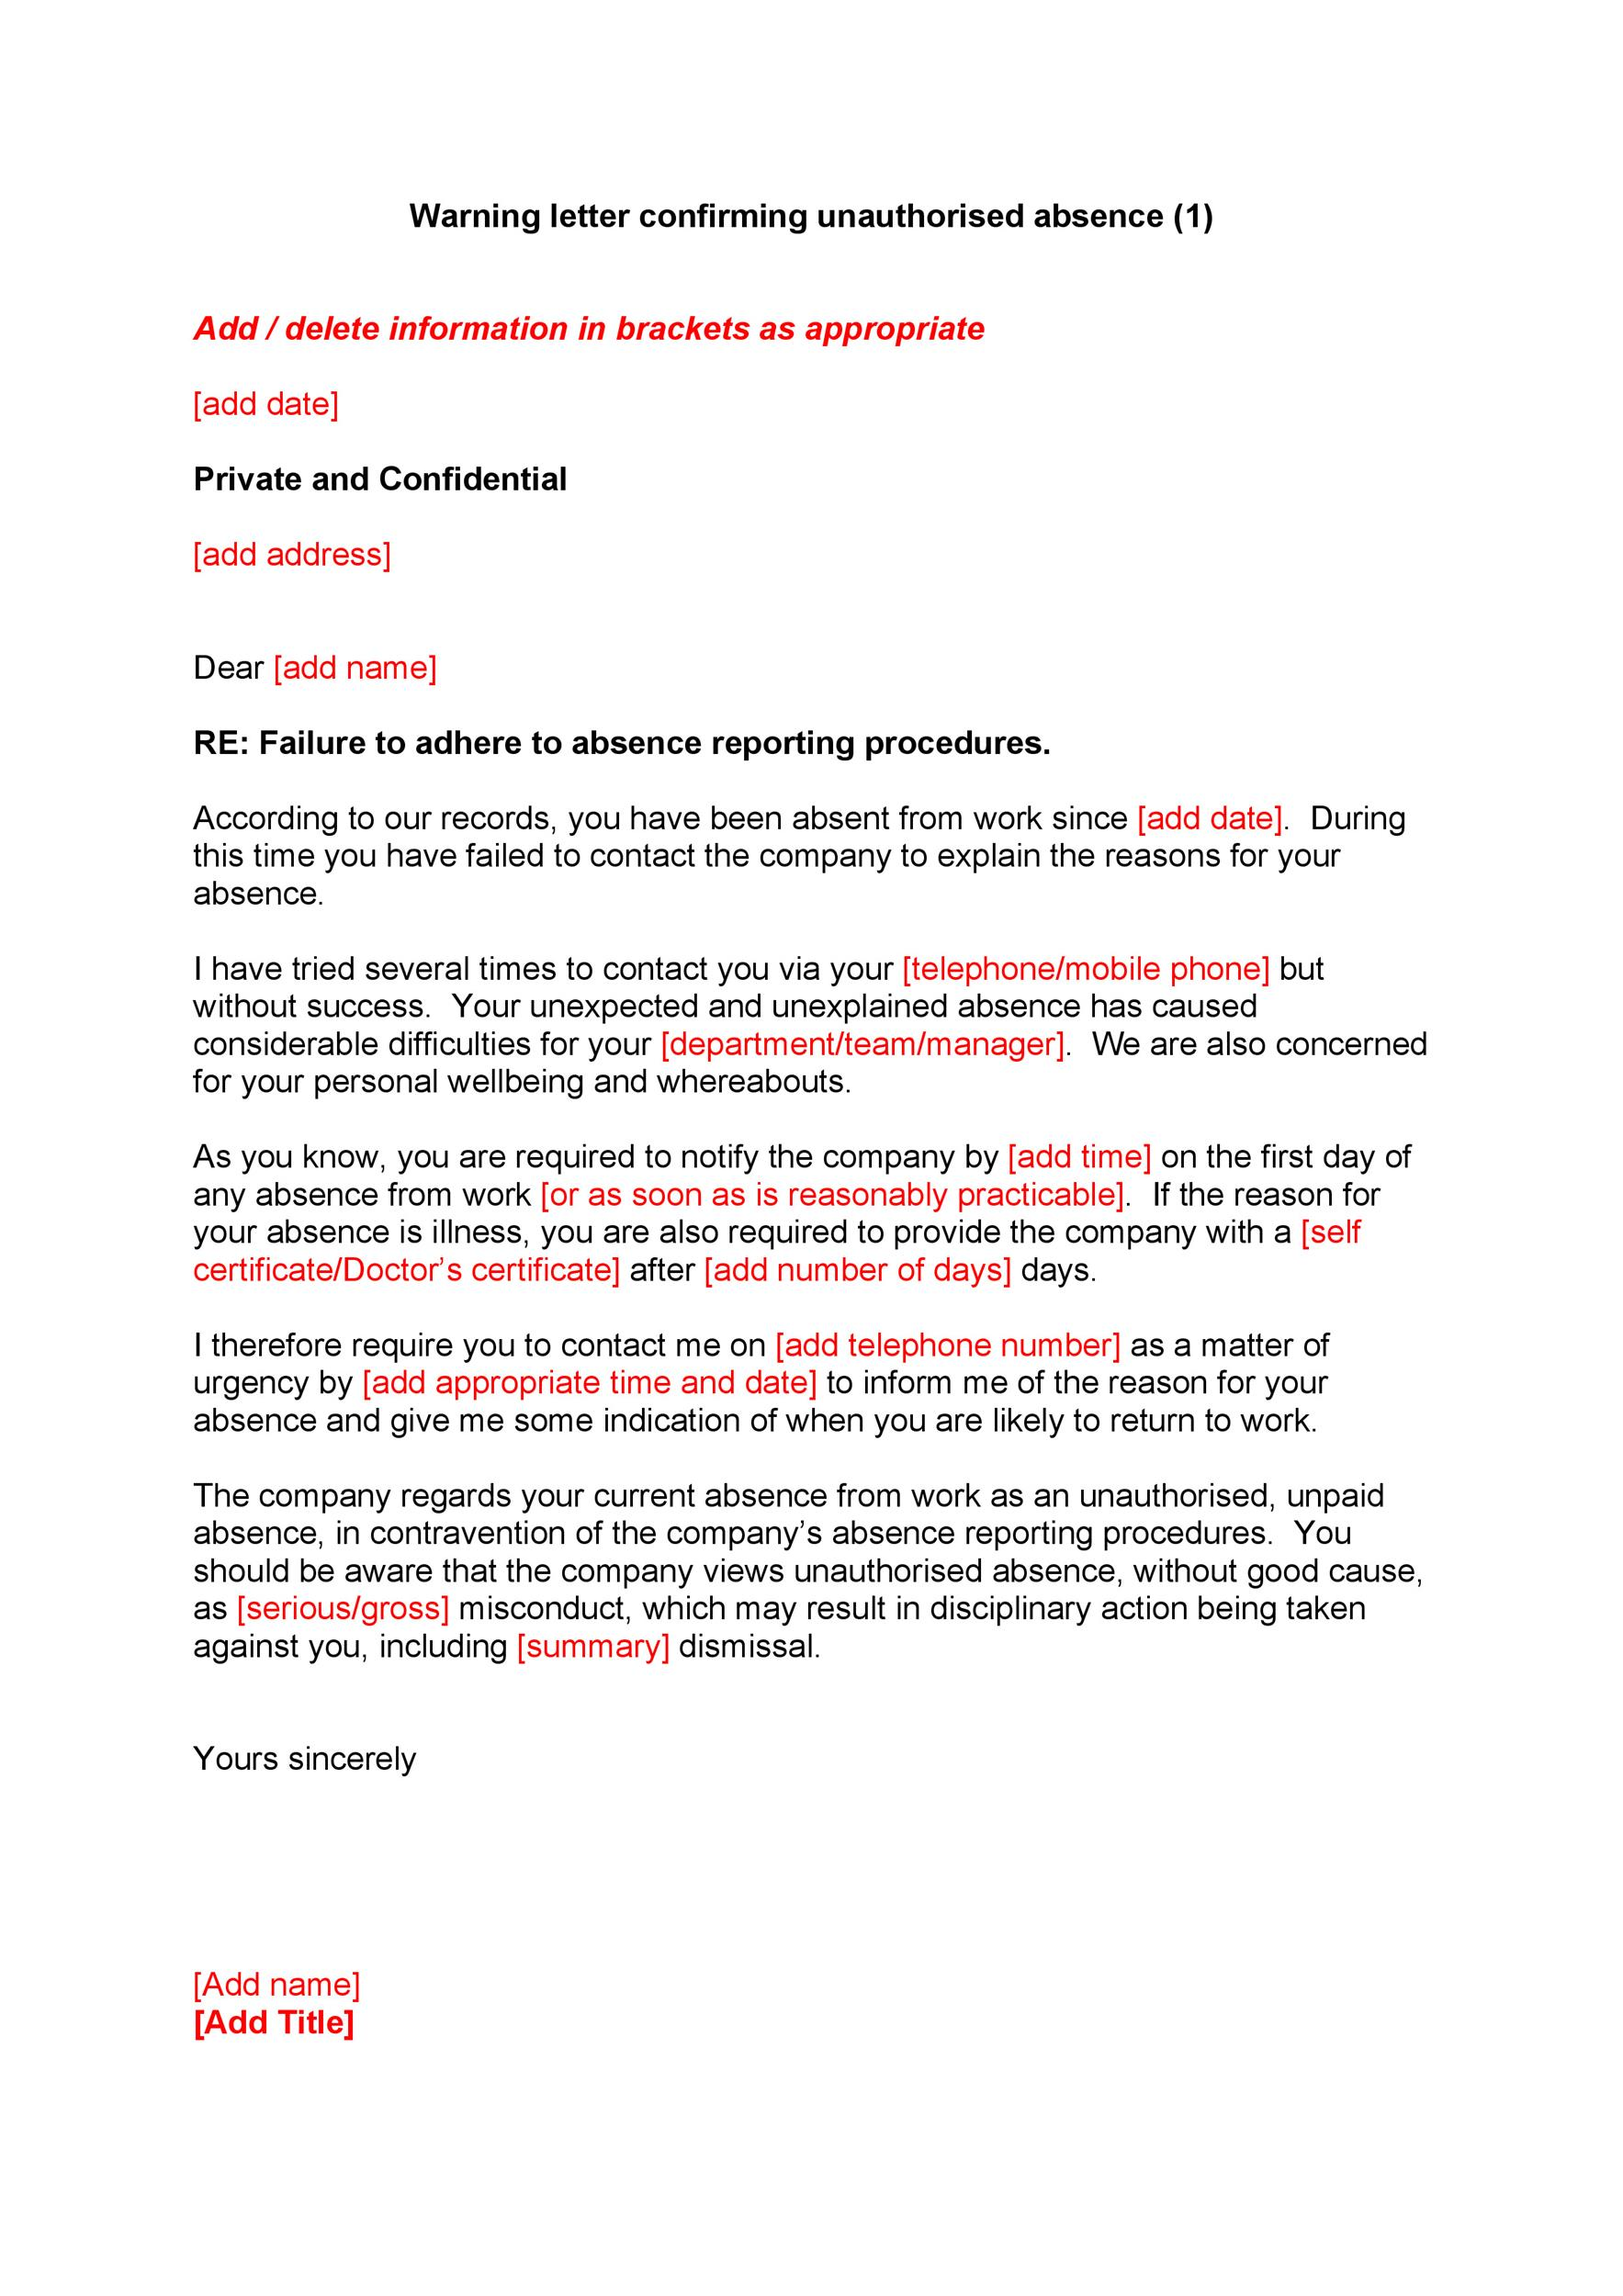 Free employee warning letter 33